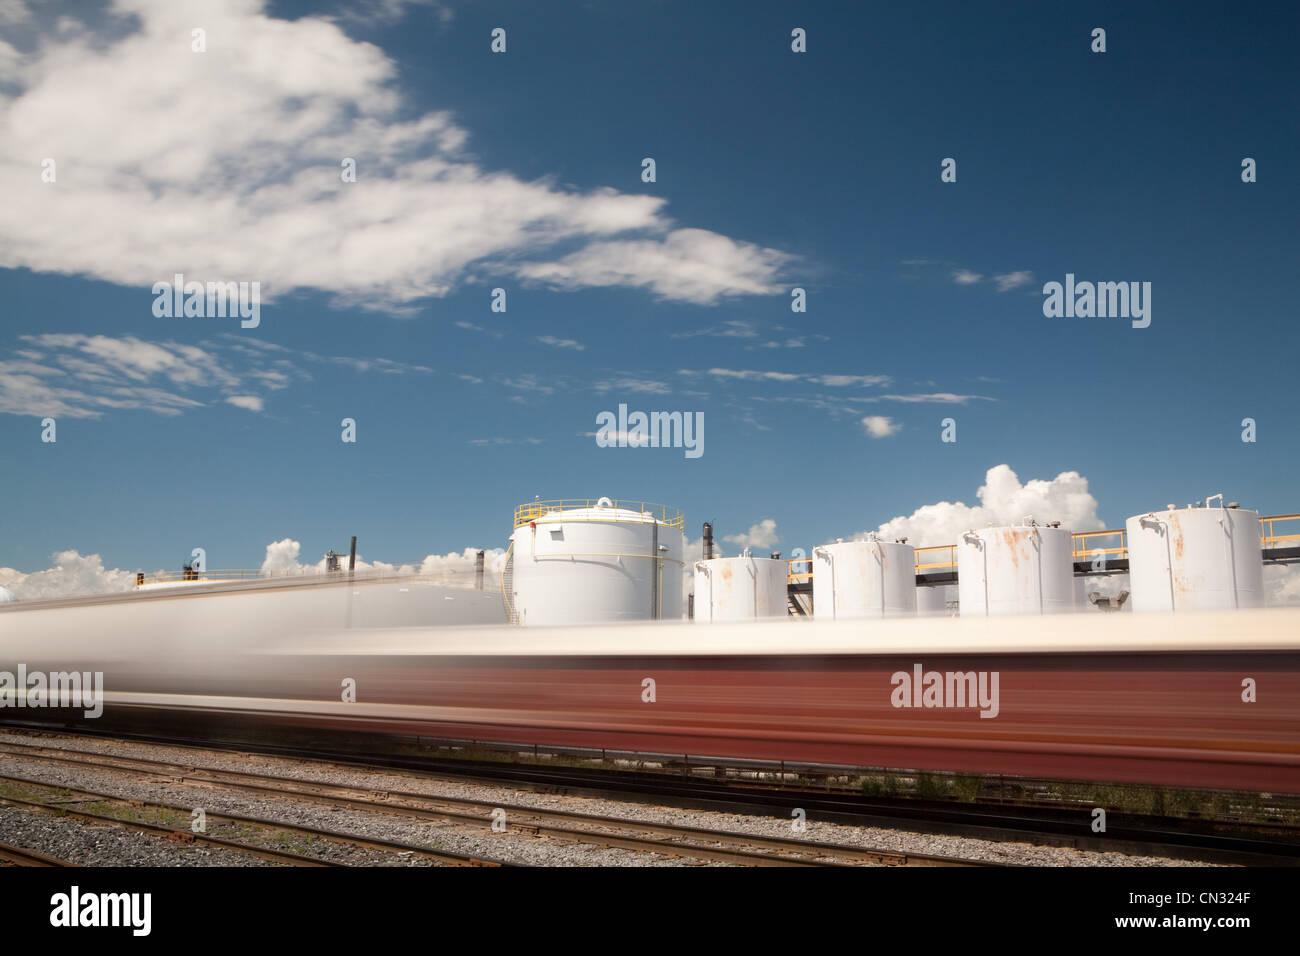 Train tracks and silos - Stock Image